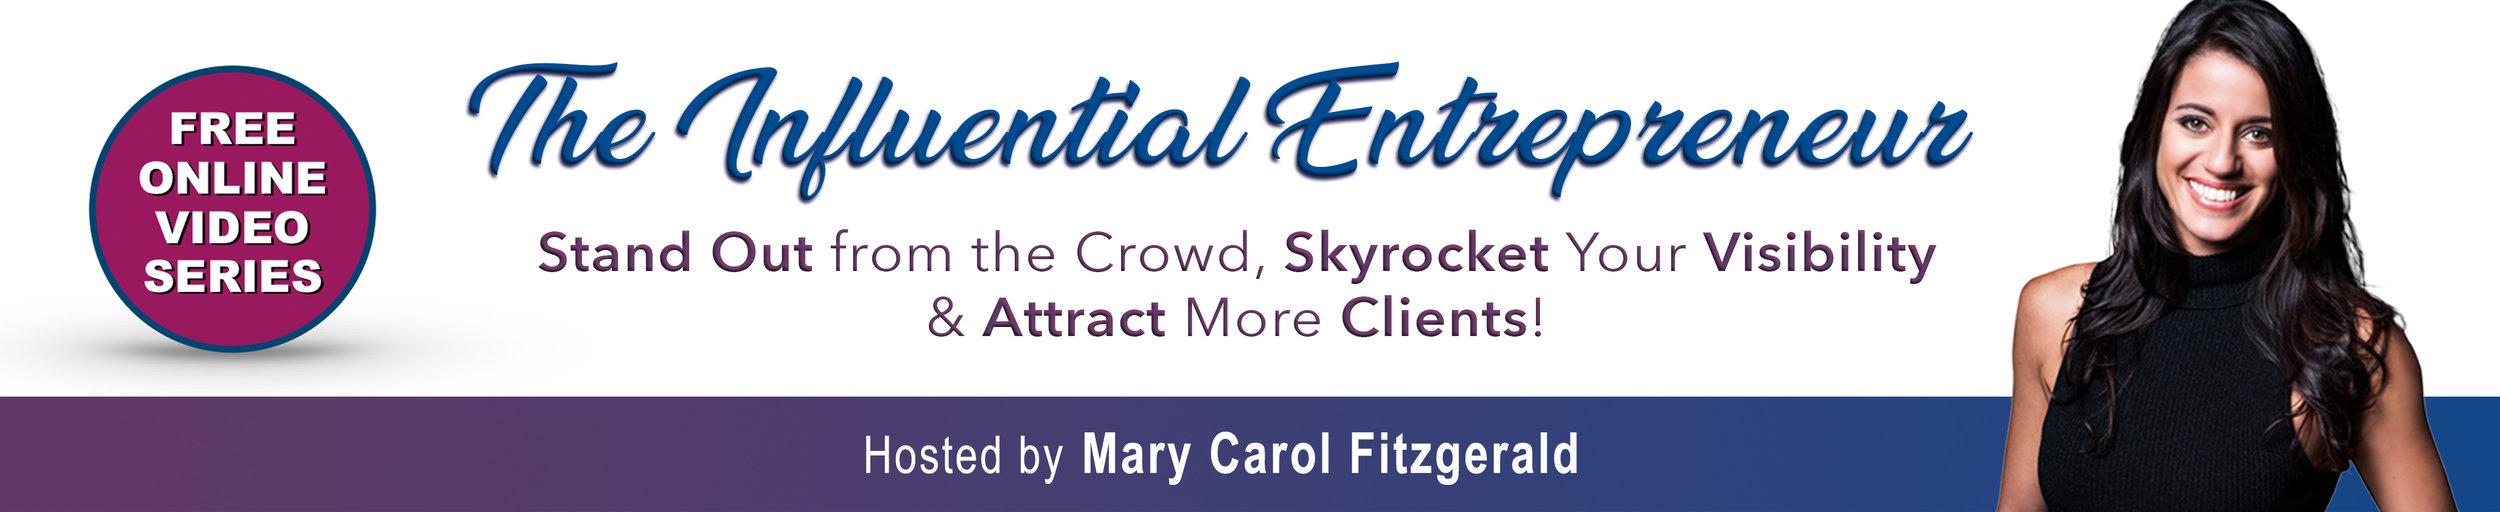 The-Influential-Entrepreneur_Mary-Carol-Fitzgerald-ANDANDAblue-ROUNDbanner-MAIN-1.jpg